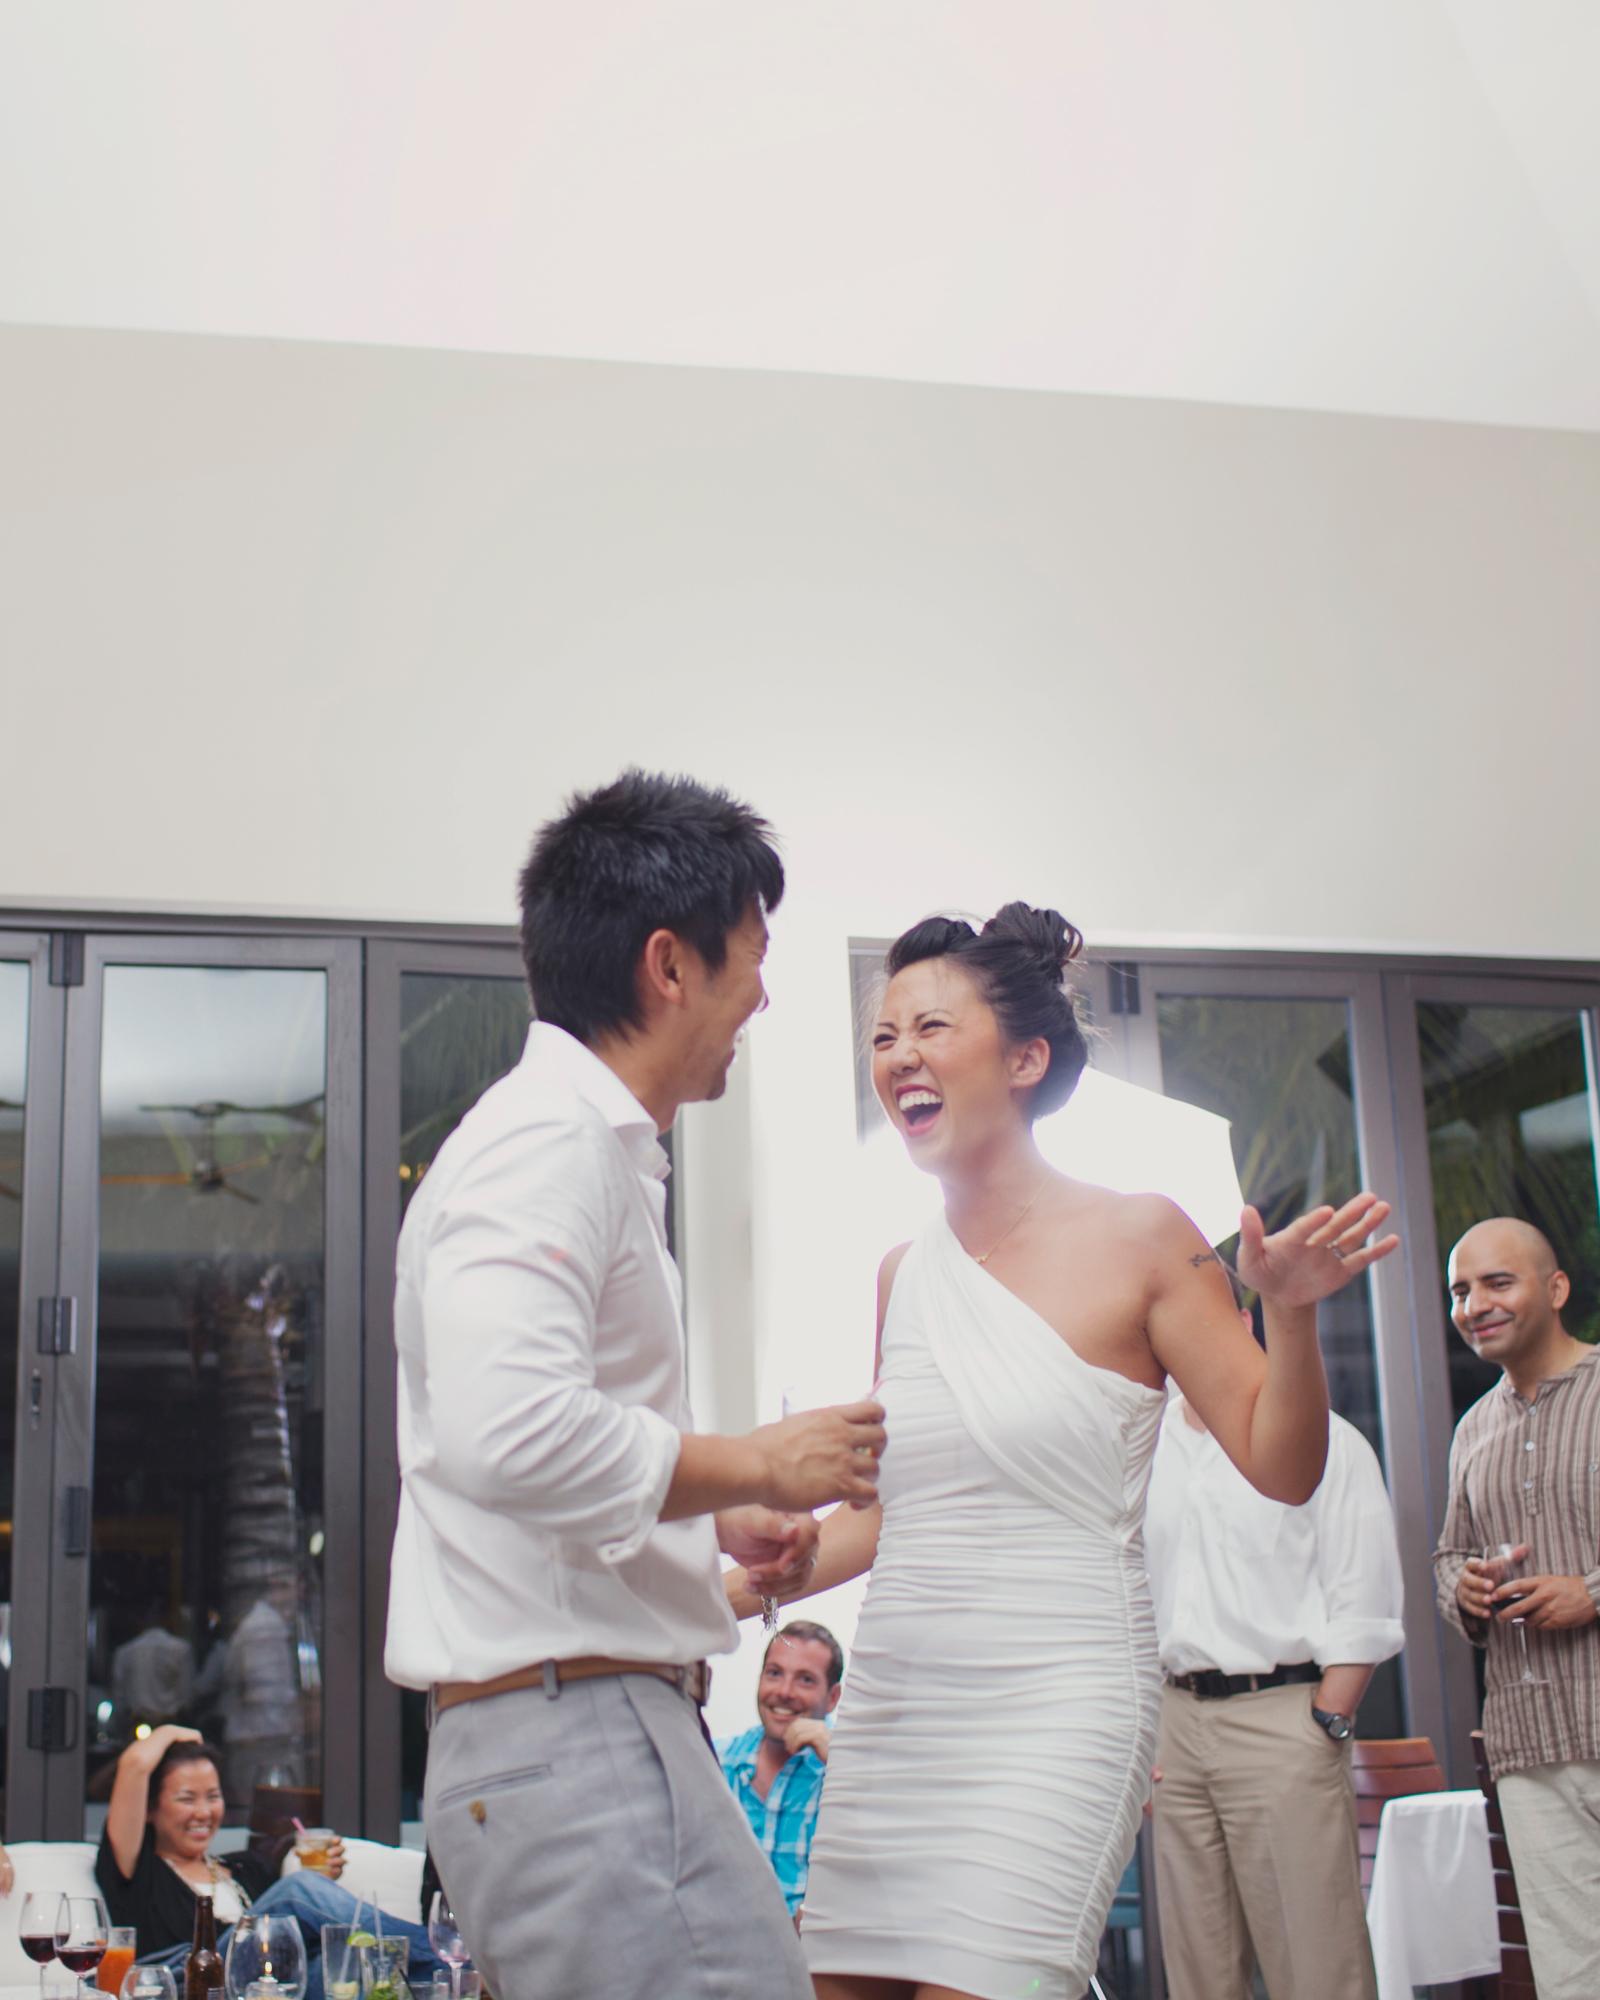 real-weddings-jessica-bobby-0811-585.jpg